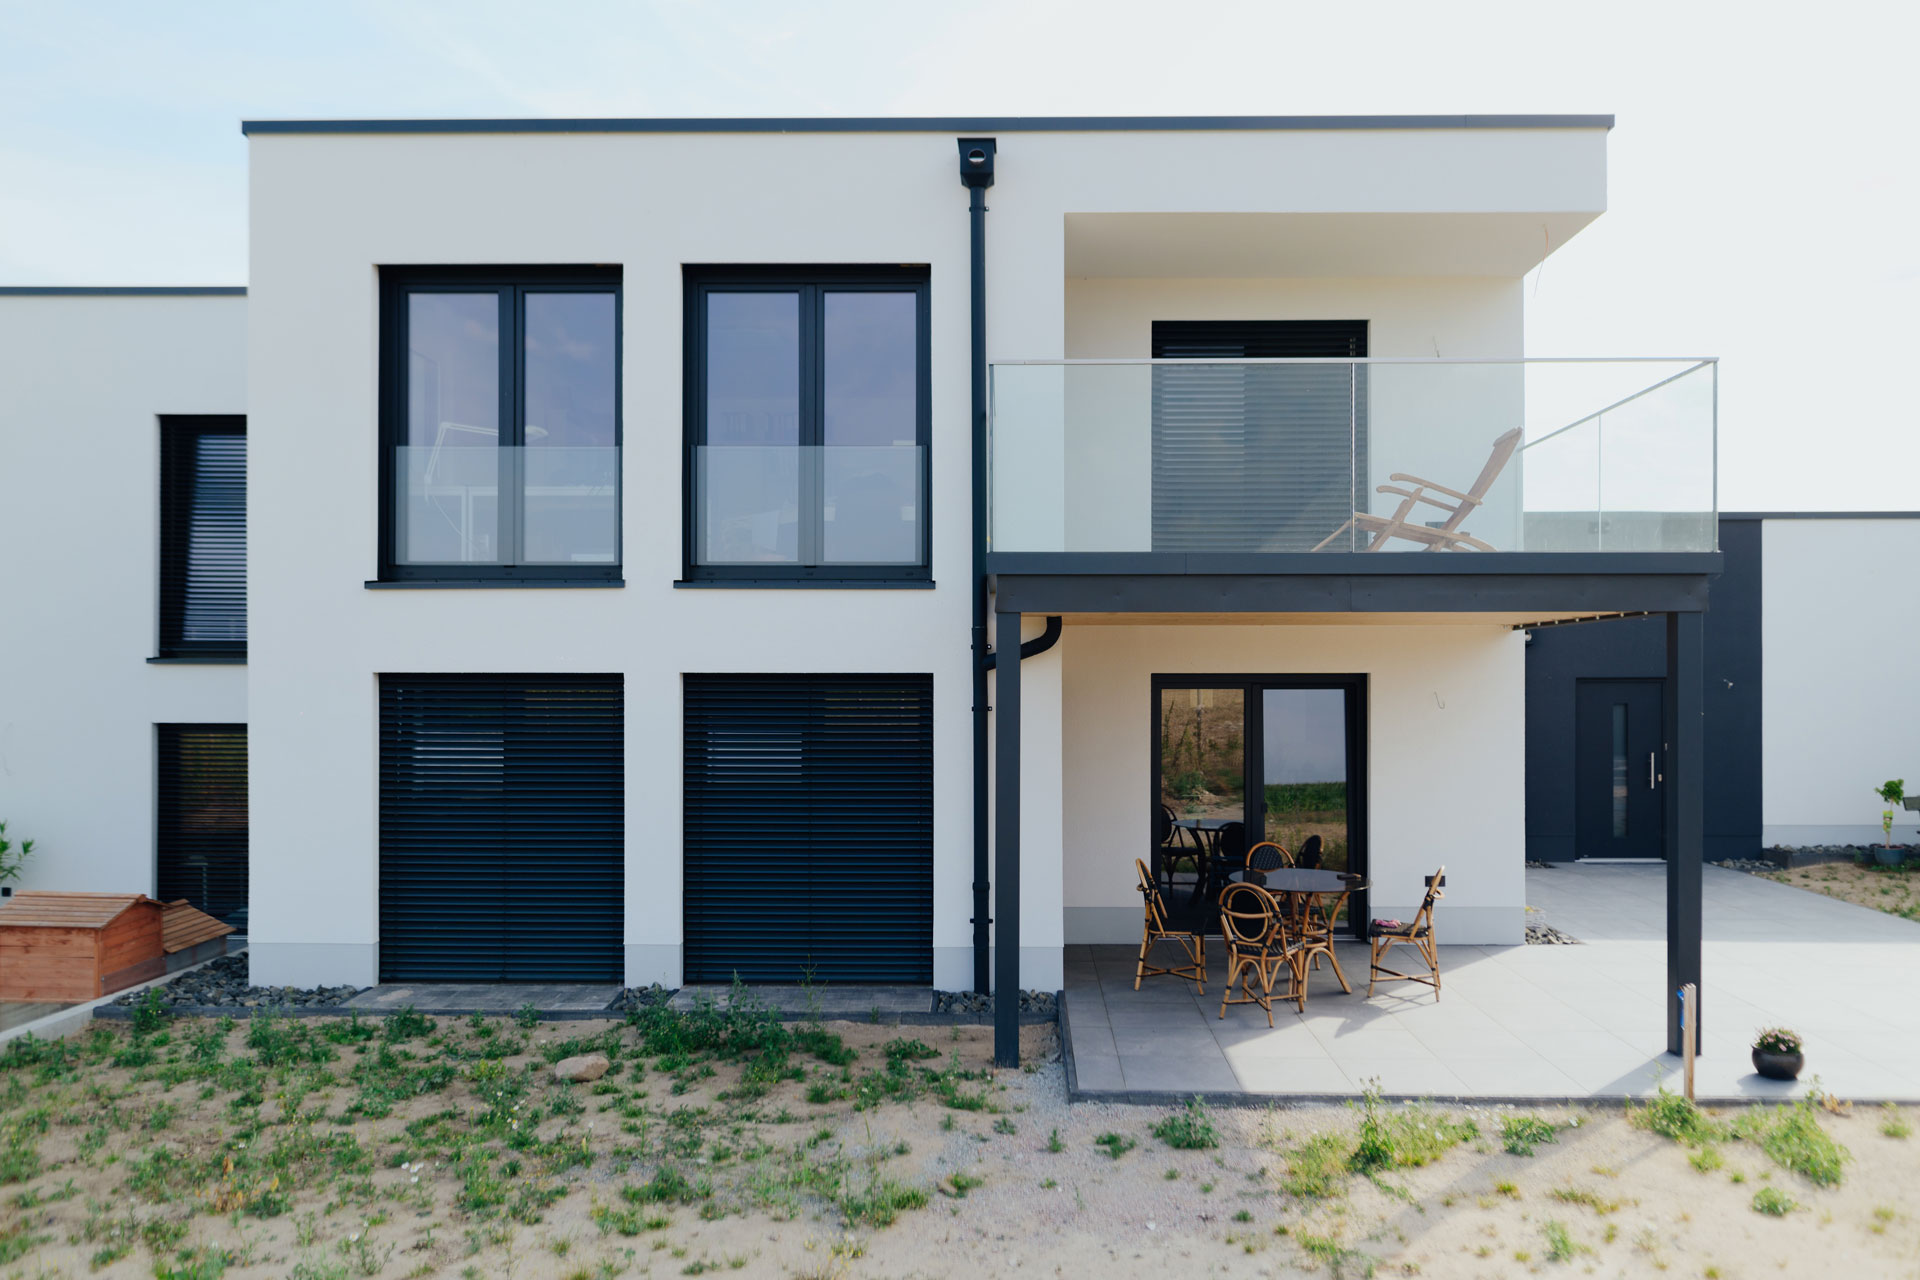 Doppelhaus in Wismar (01) / Nahaufnahme frontal